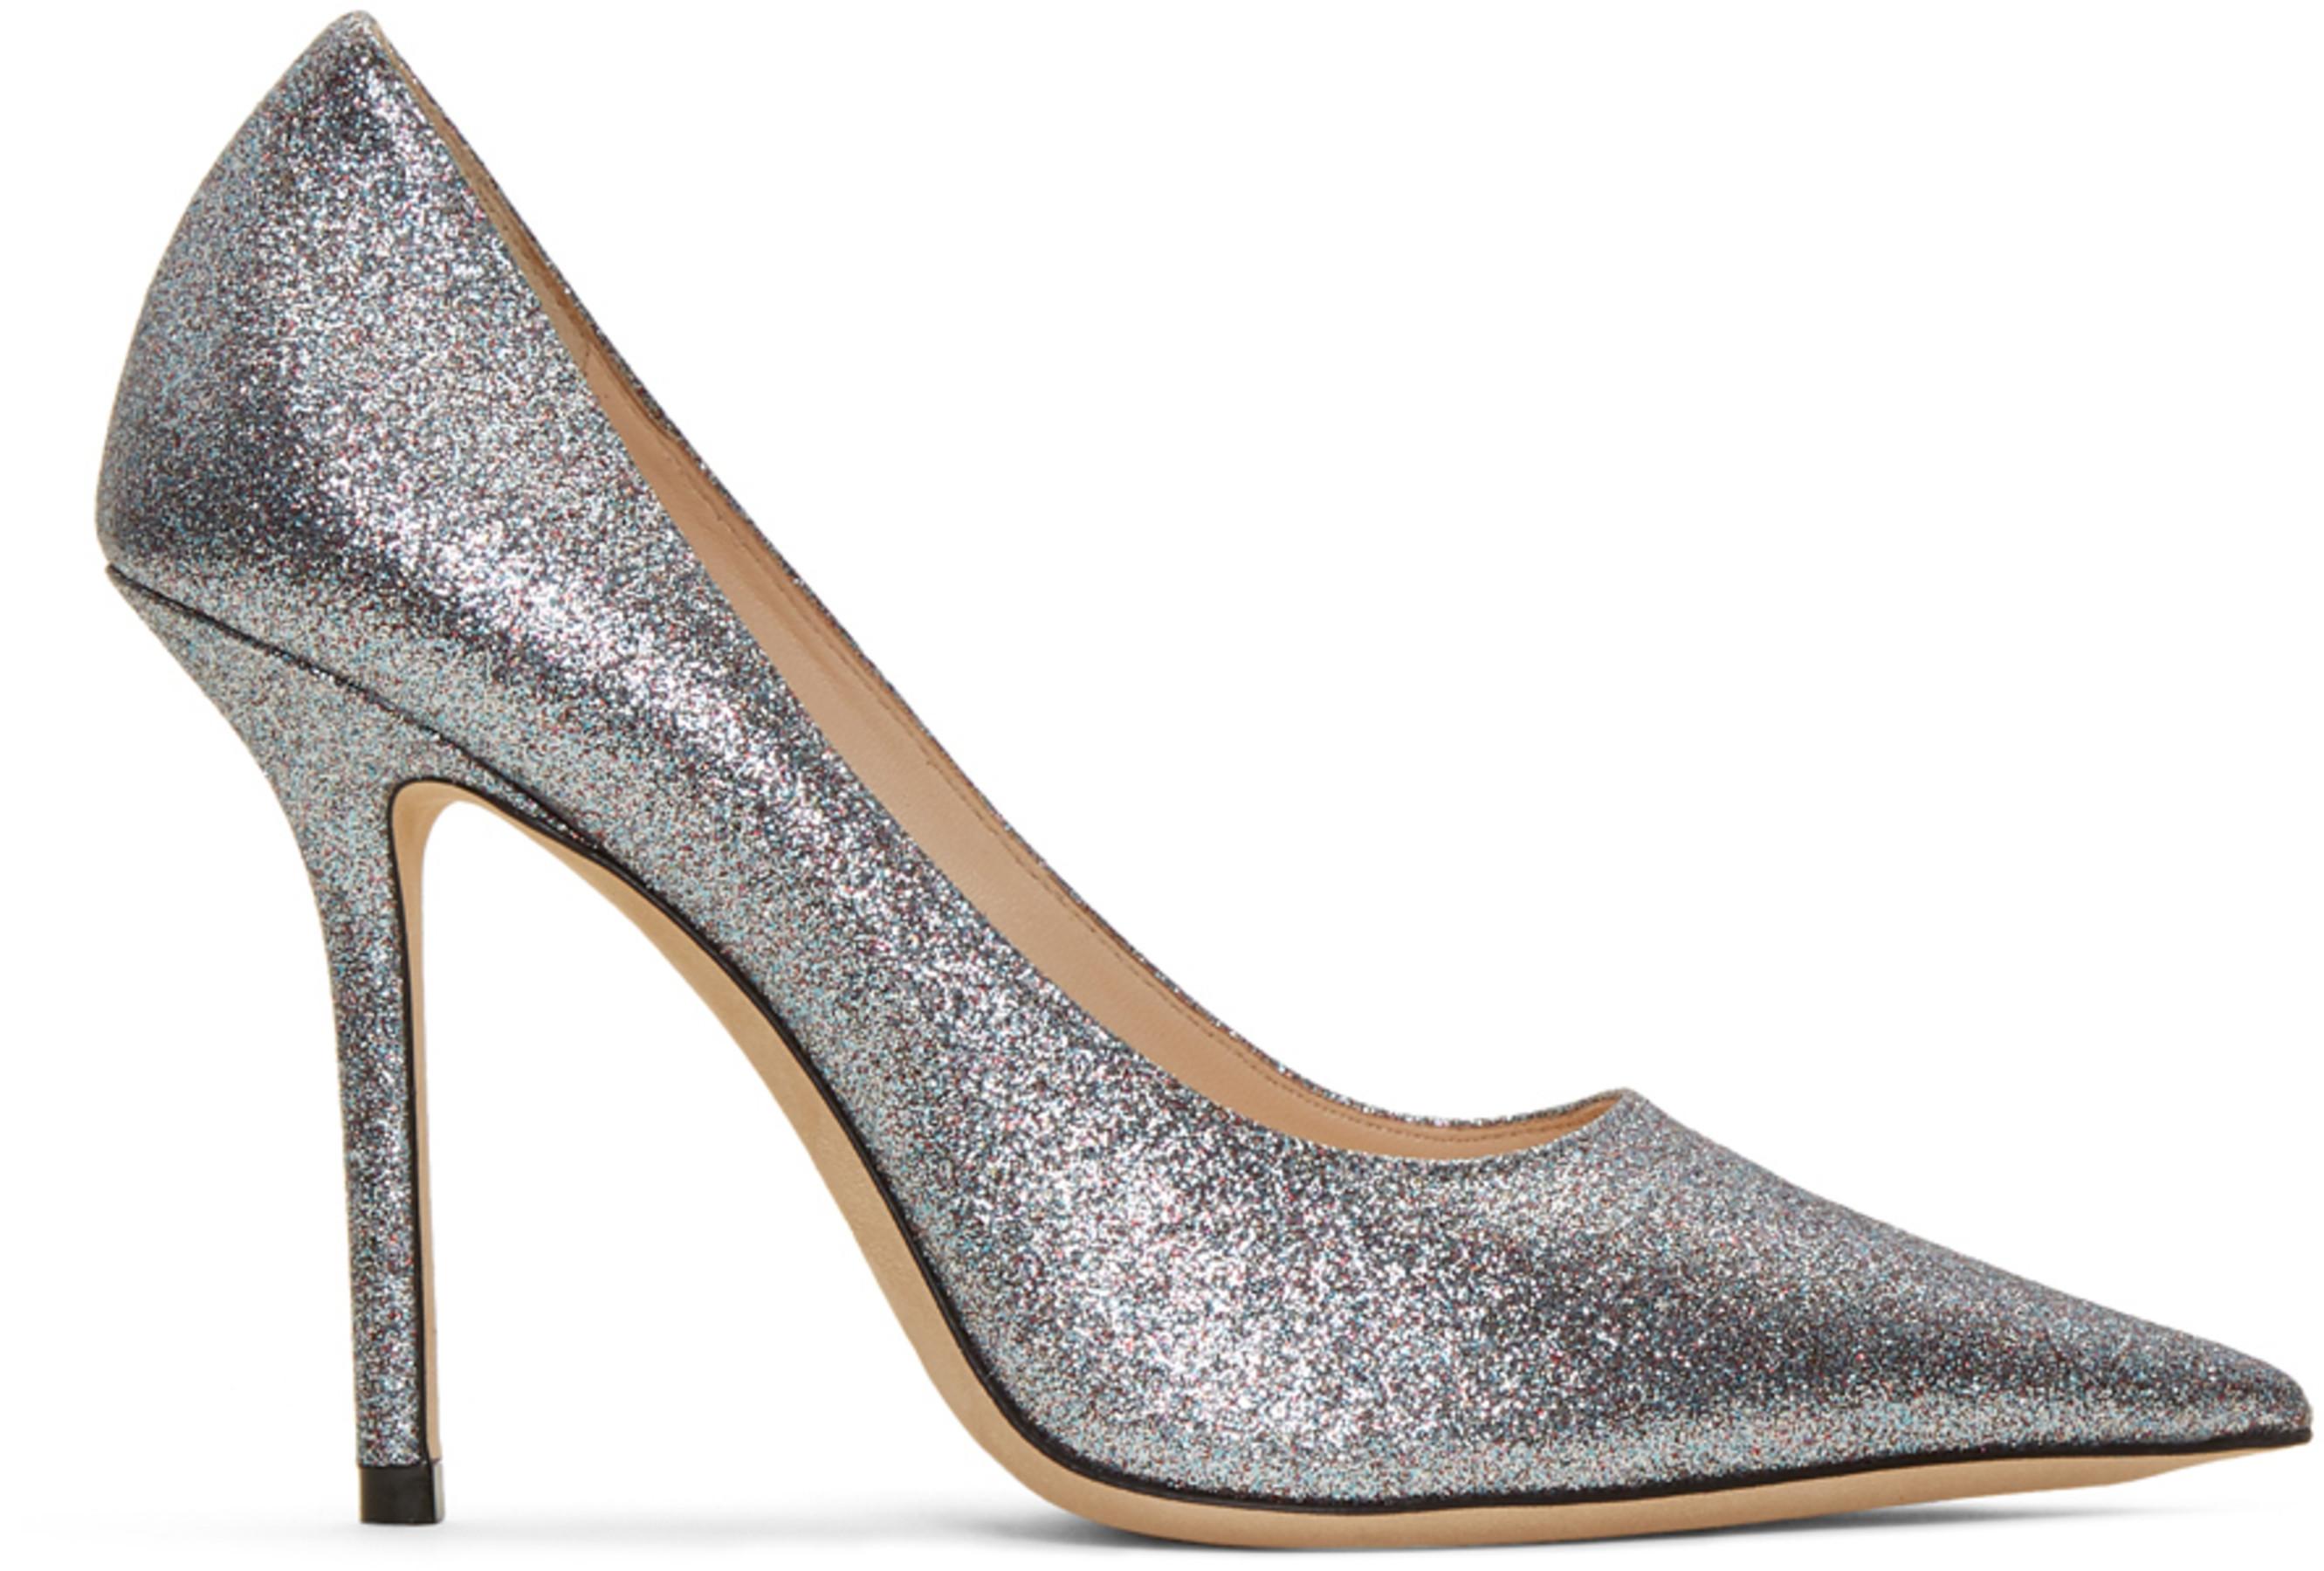 6822e385cd0b Jimmy Choo shoes for Women